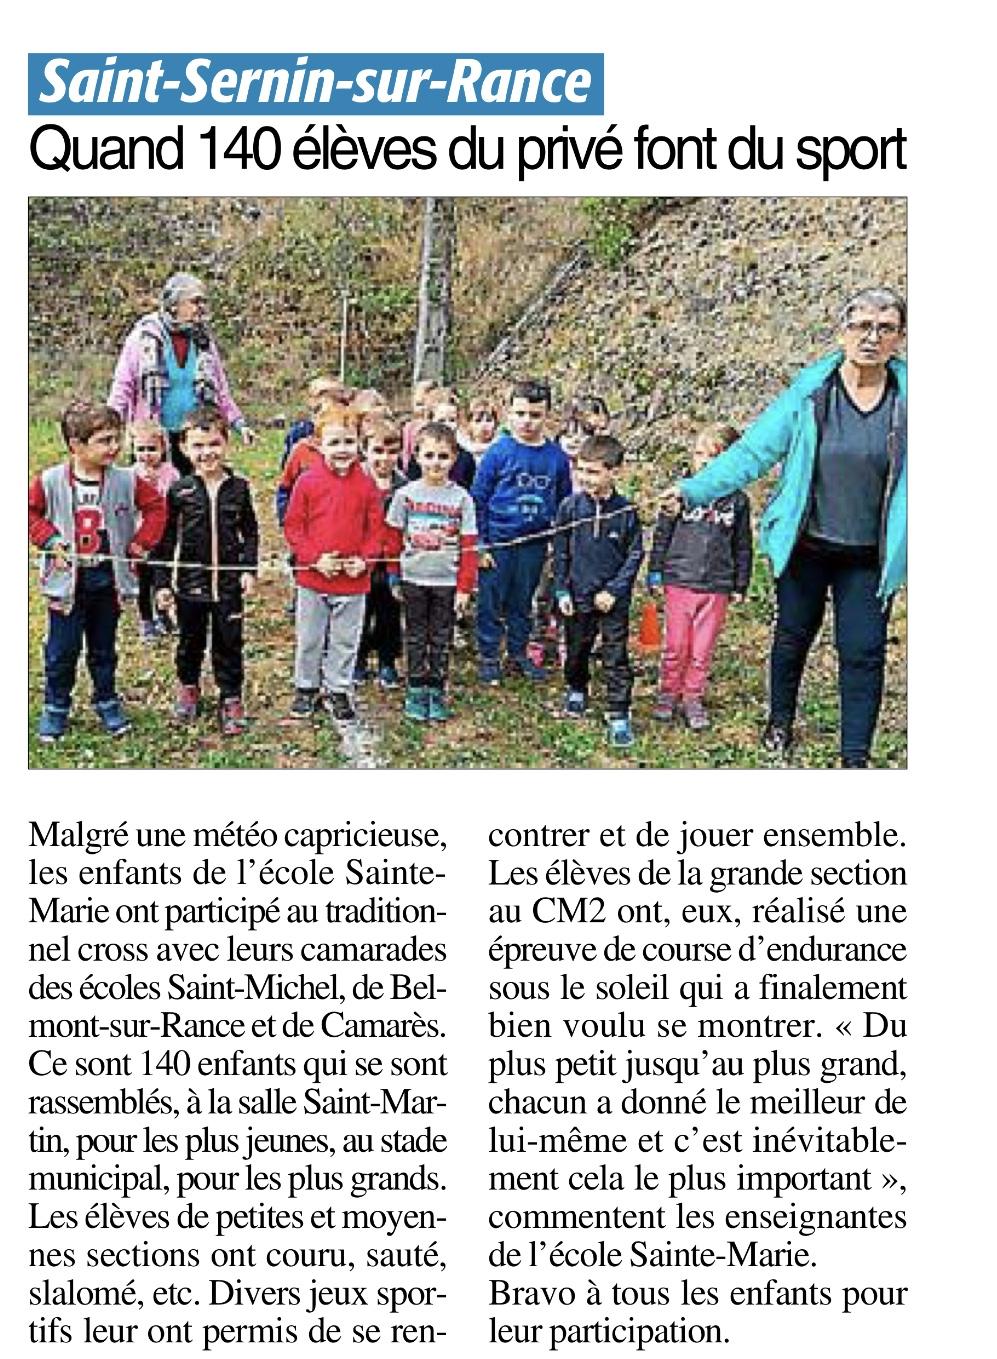 Saint-Sernin-sur-Rance – Ecole Sainte Marie